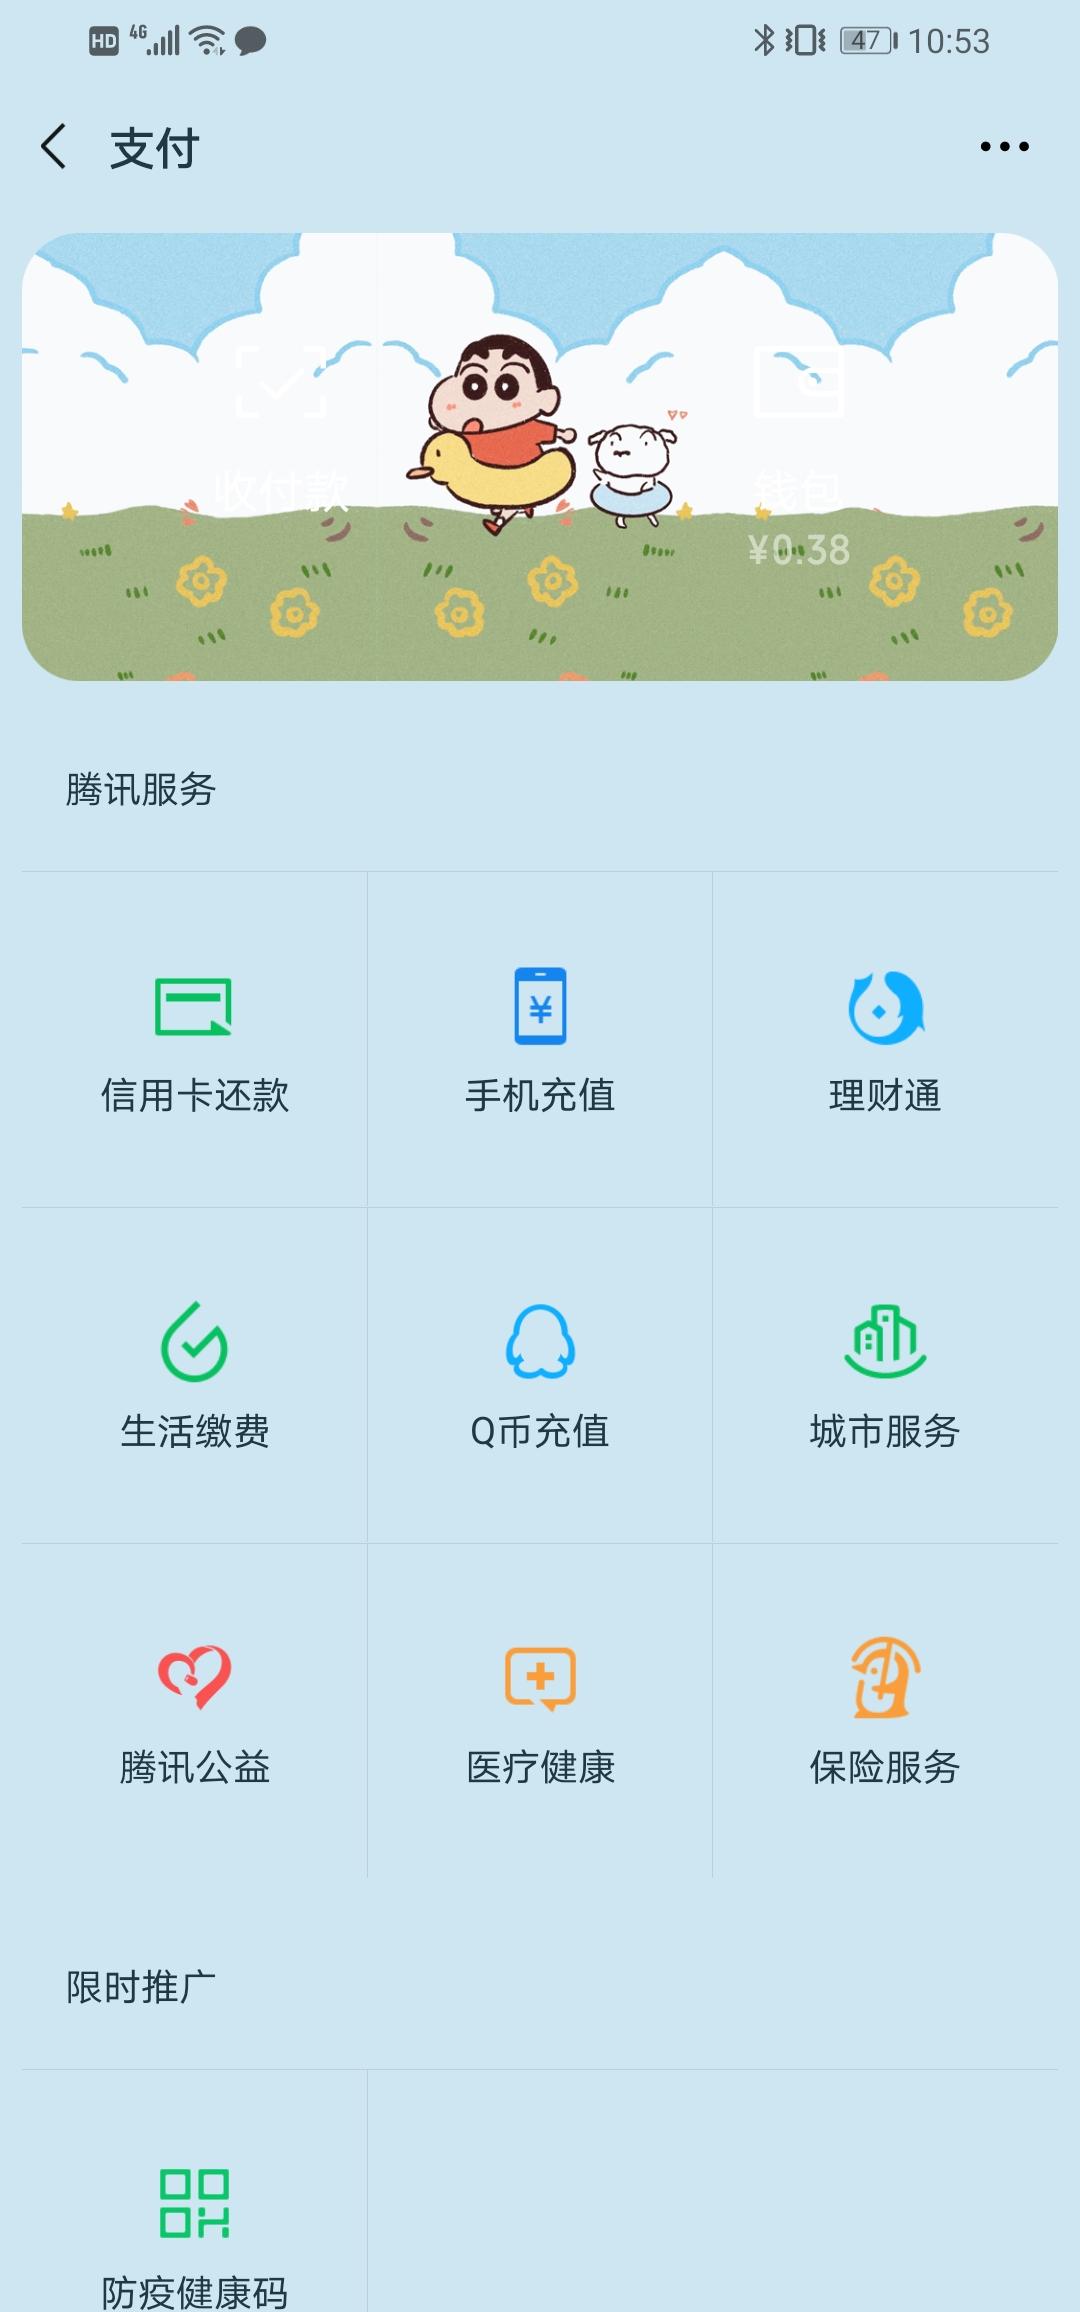 Screenshot_20201004_105309_com.tencent.mm.jpg